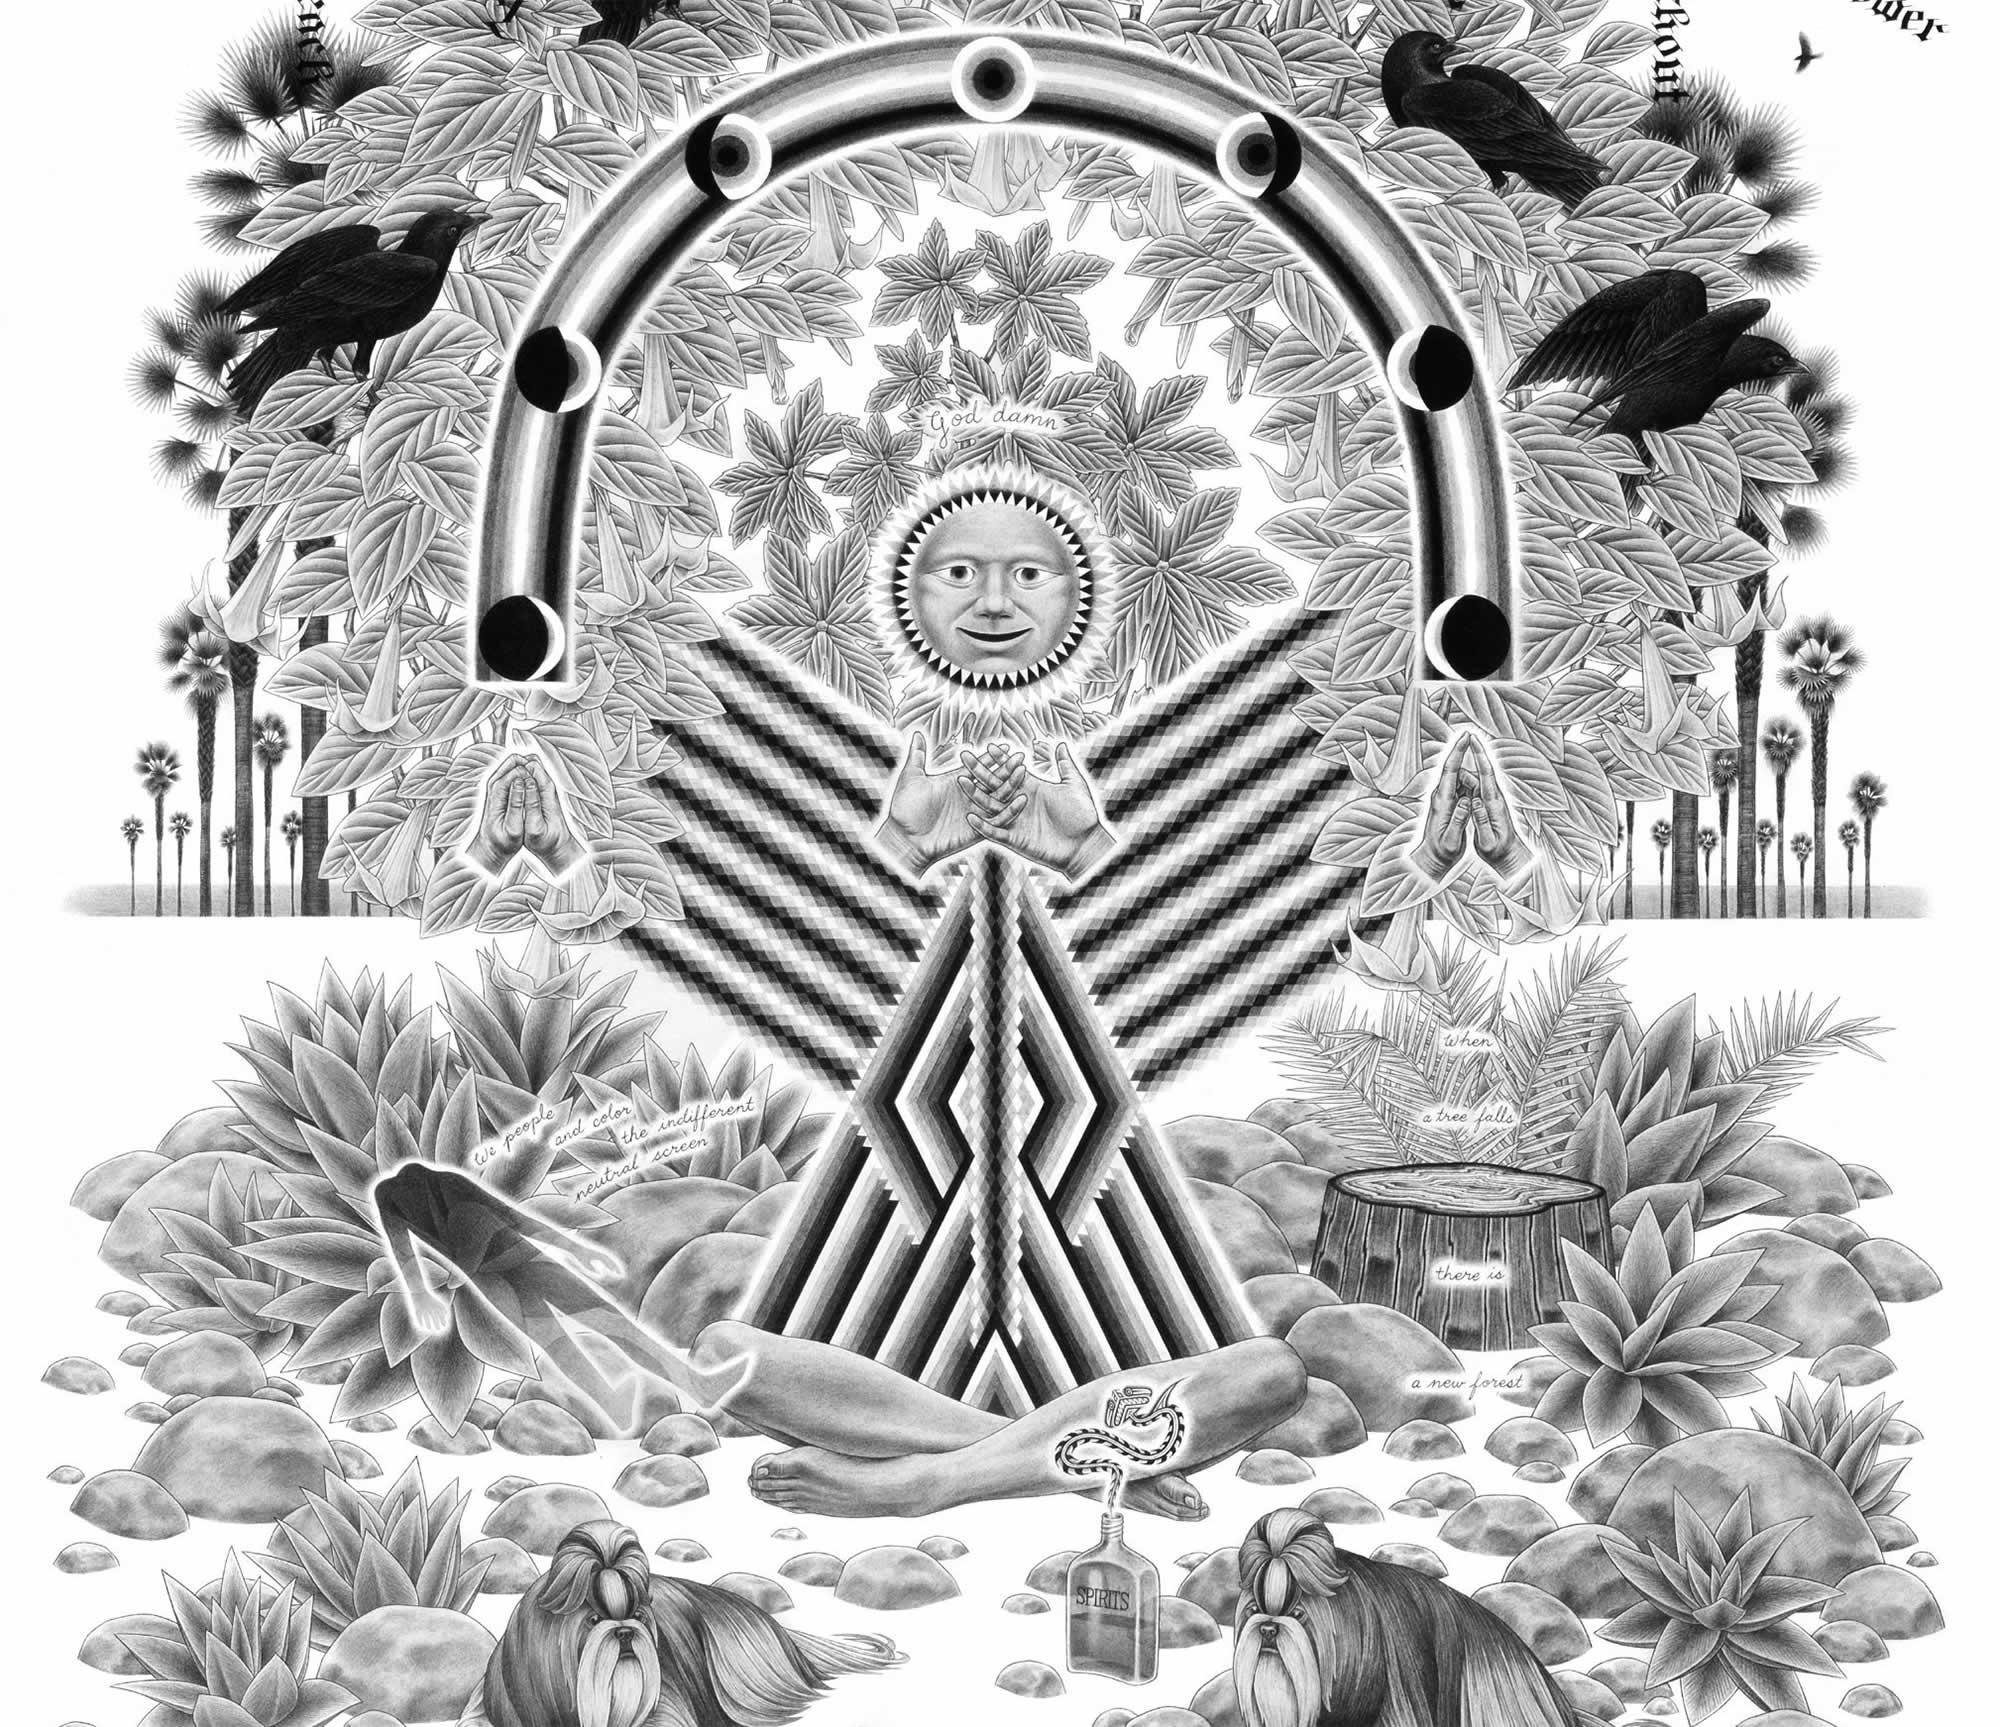 Eric Beltz's Vision of an American Mythology